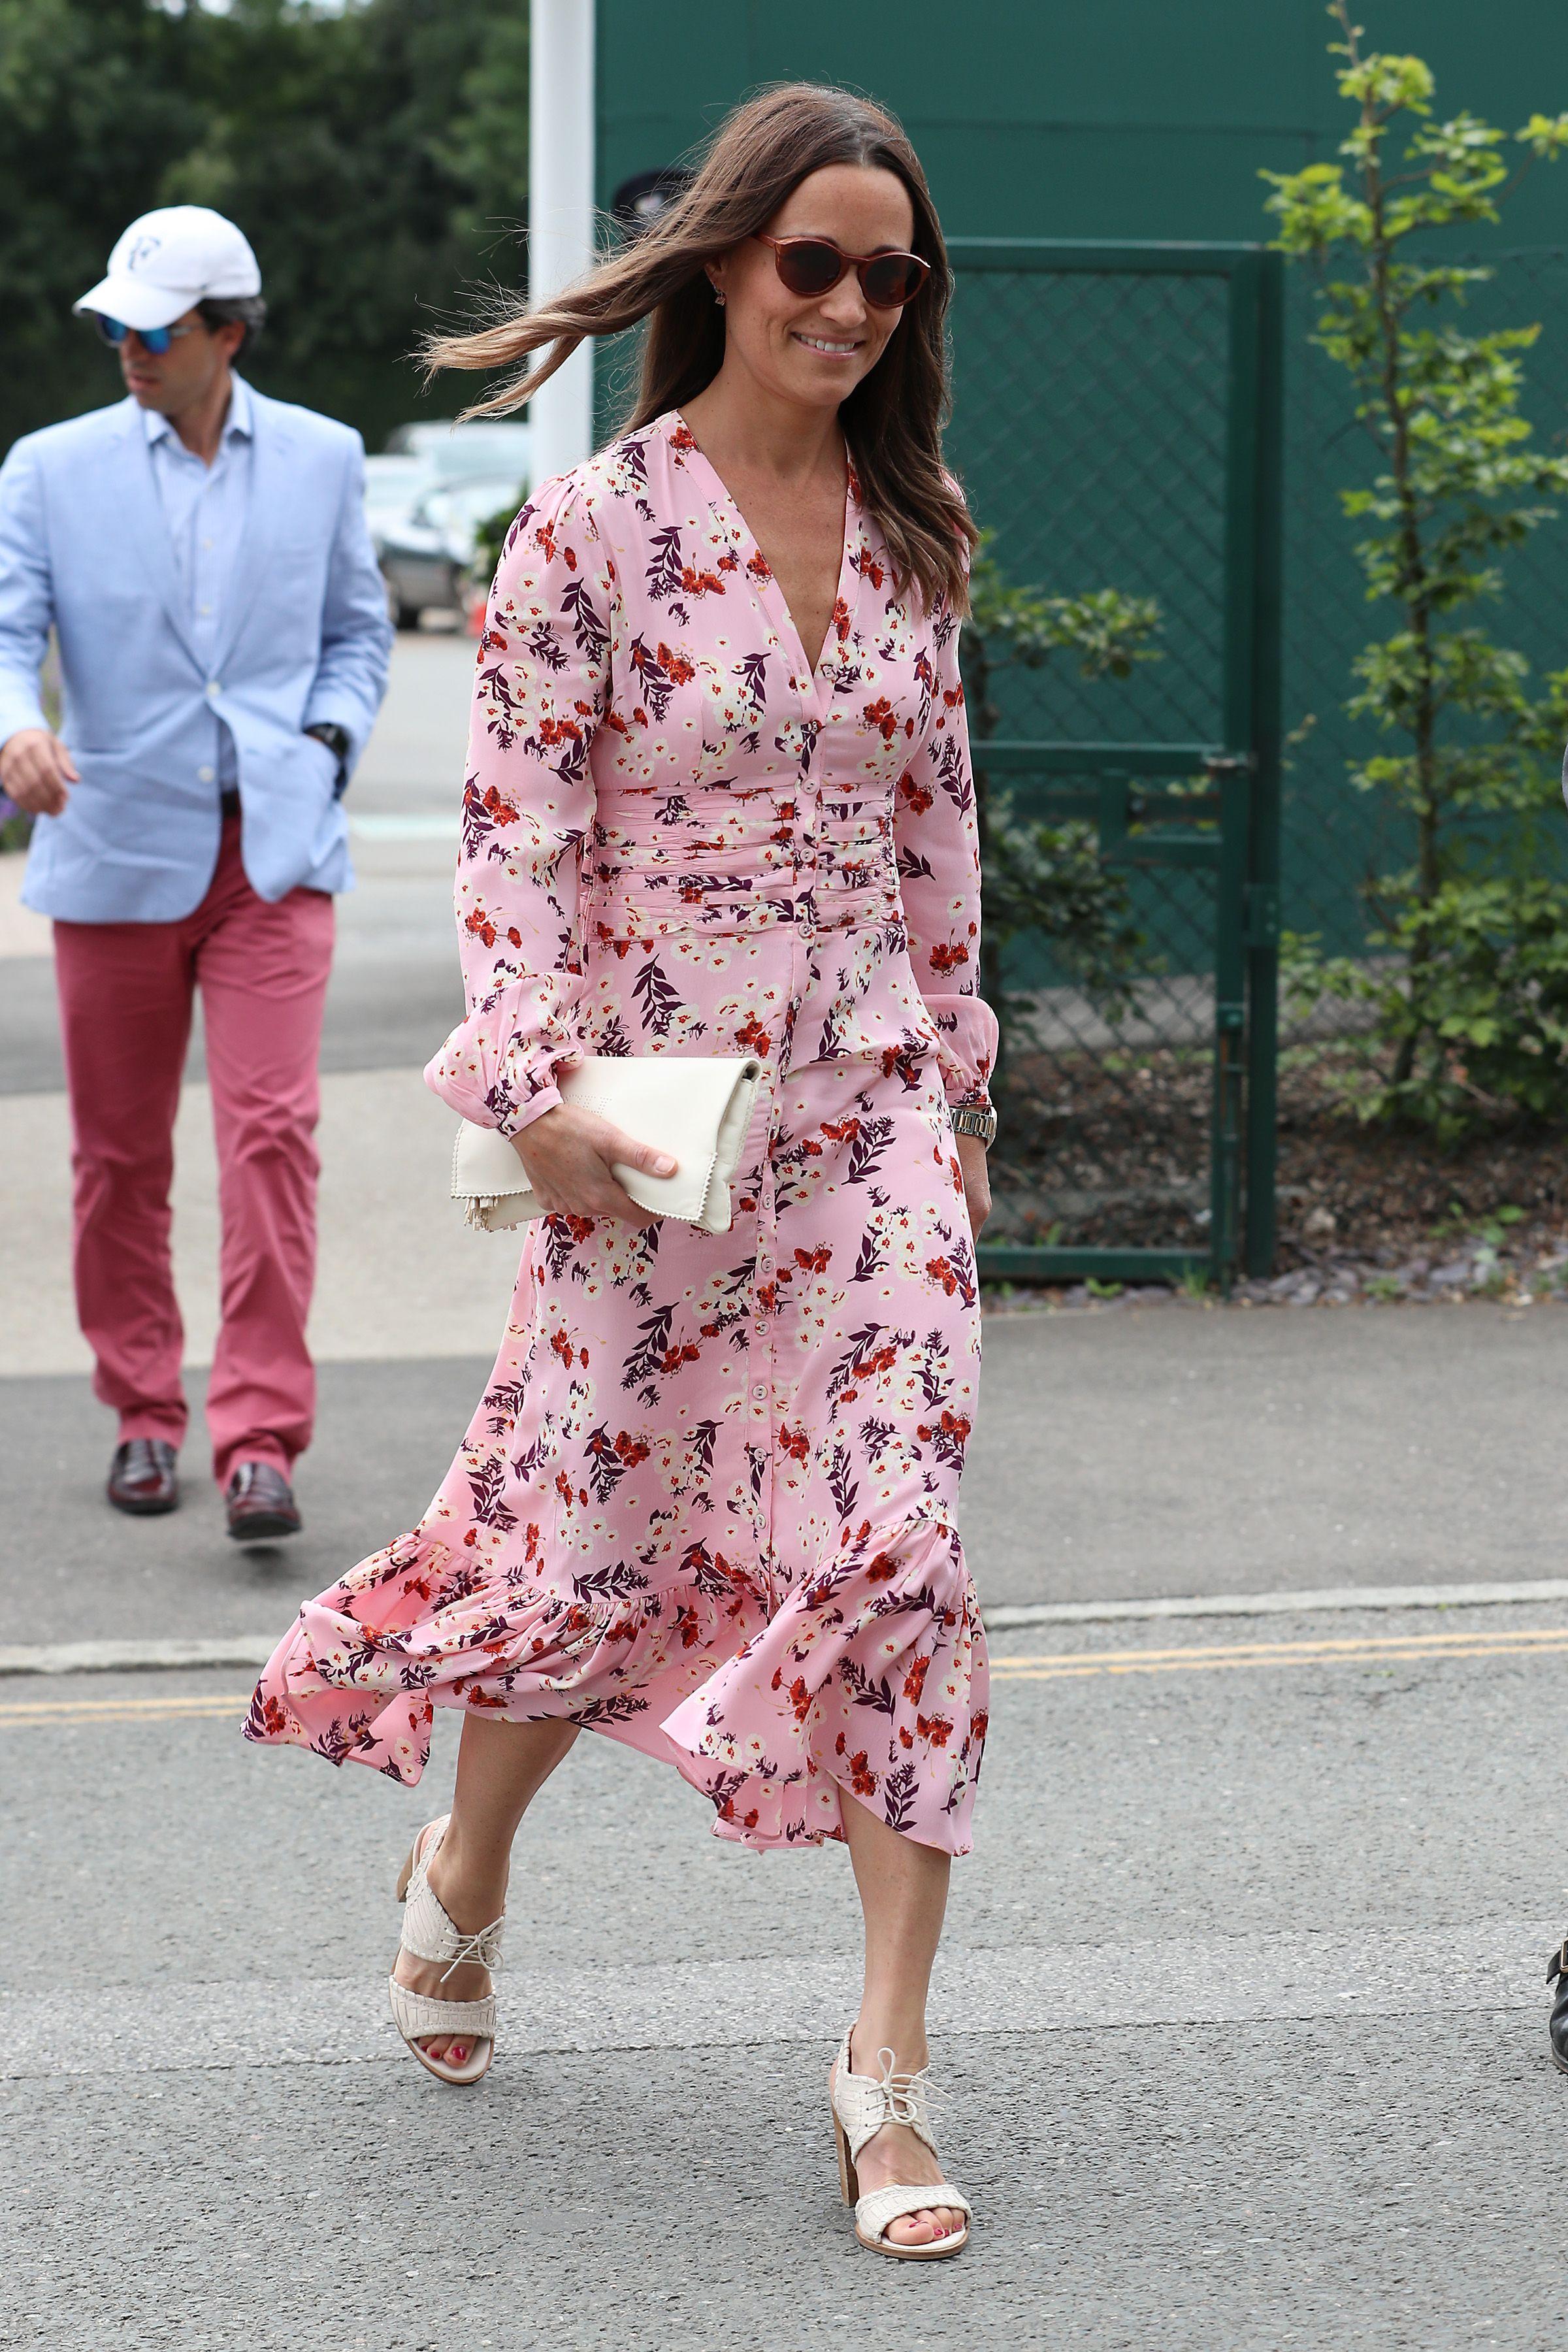 Best Style Middleton's Ehib9ewd2y Pippa Looks Evolution eDIWbYH2E9